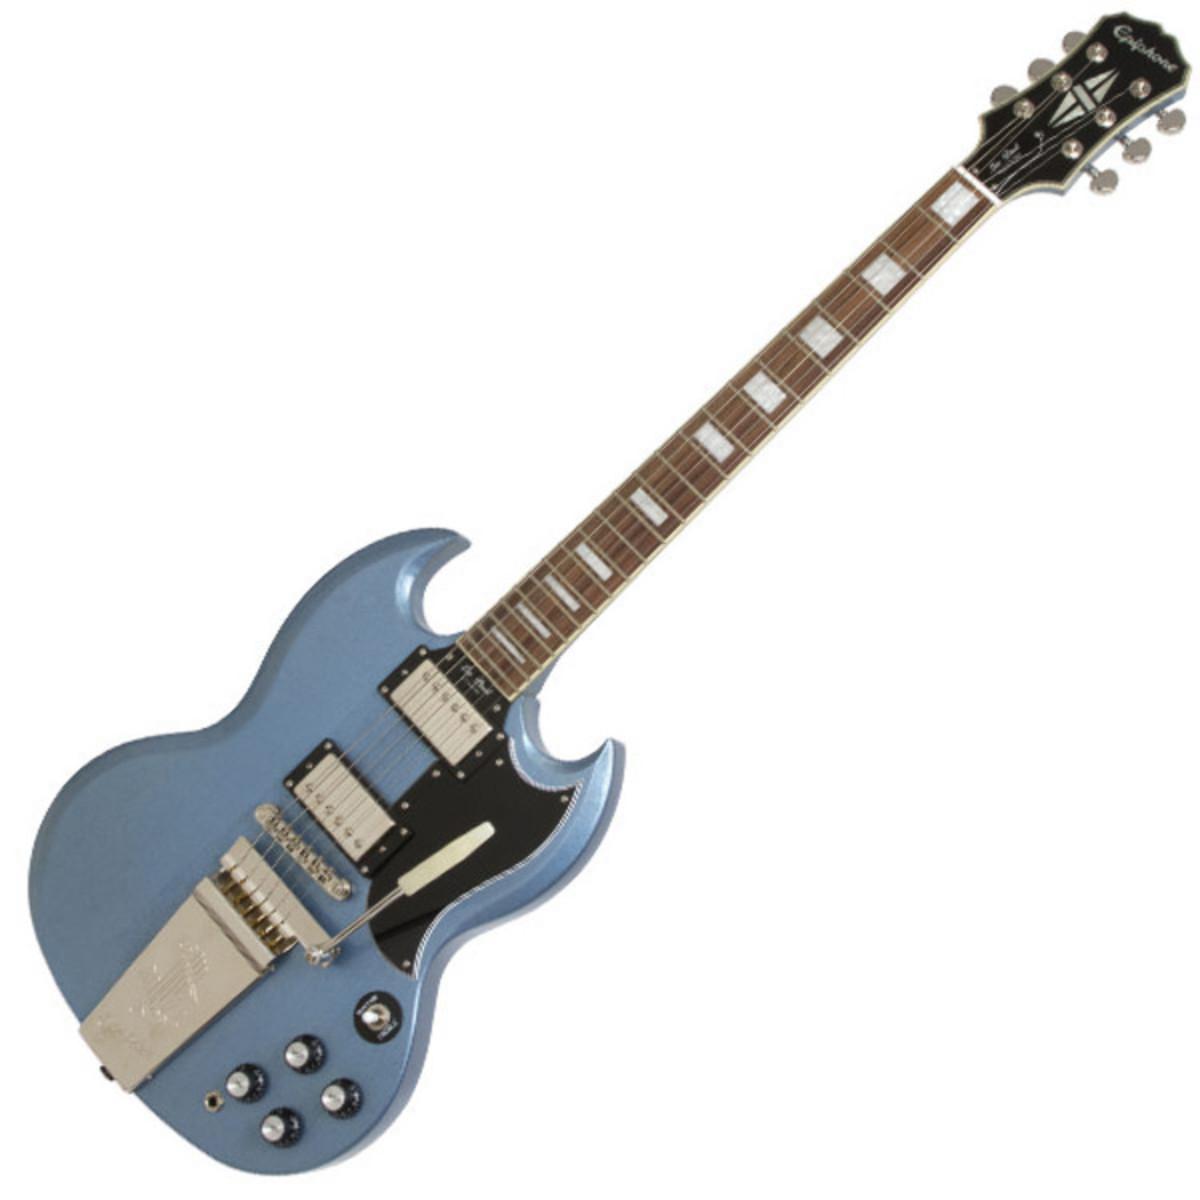 disc epiphone limited edition sg custom guitar maestro tv pelham blue at